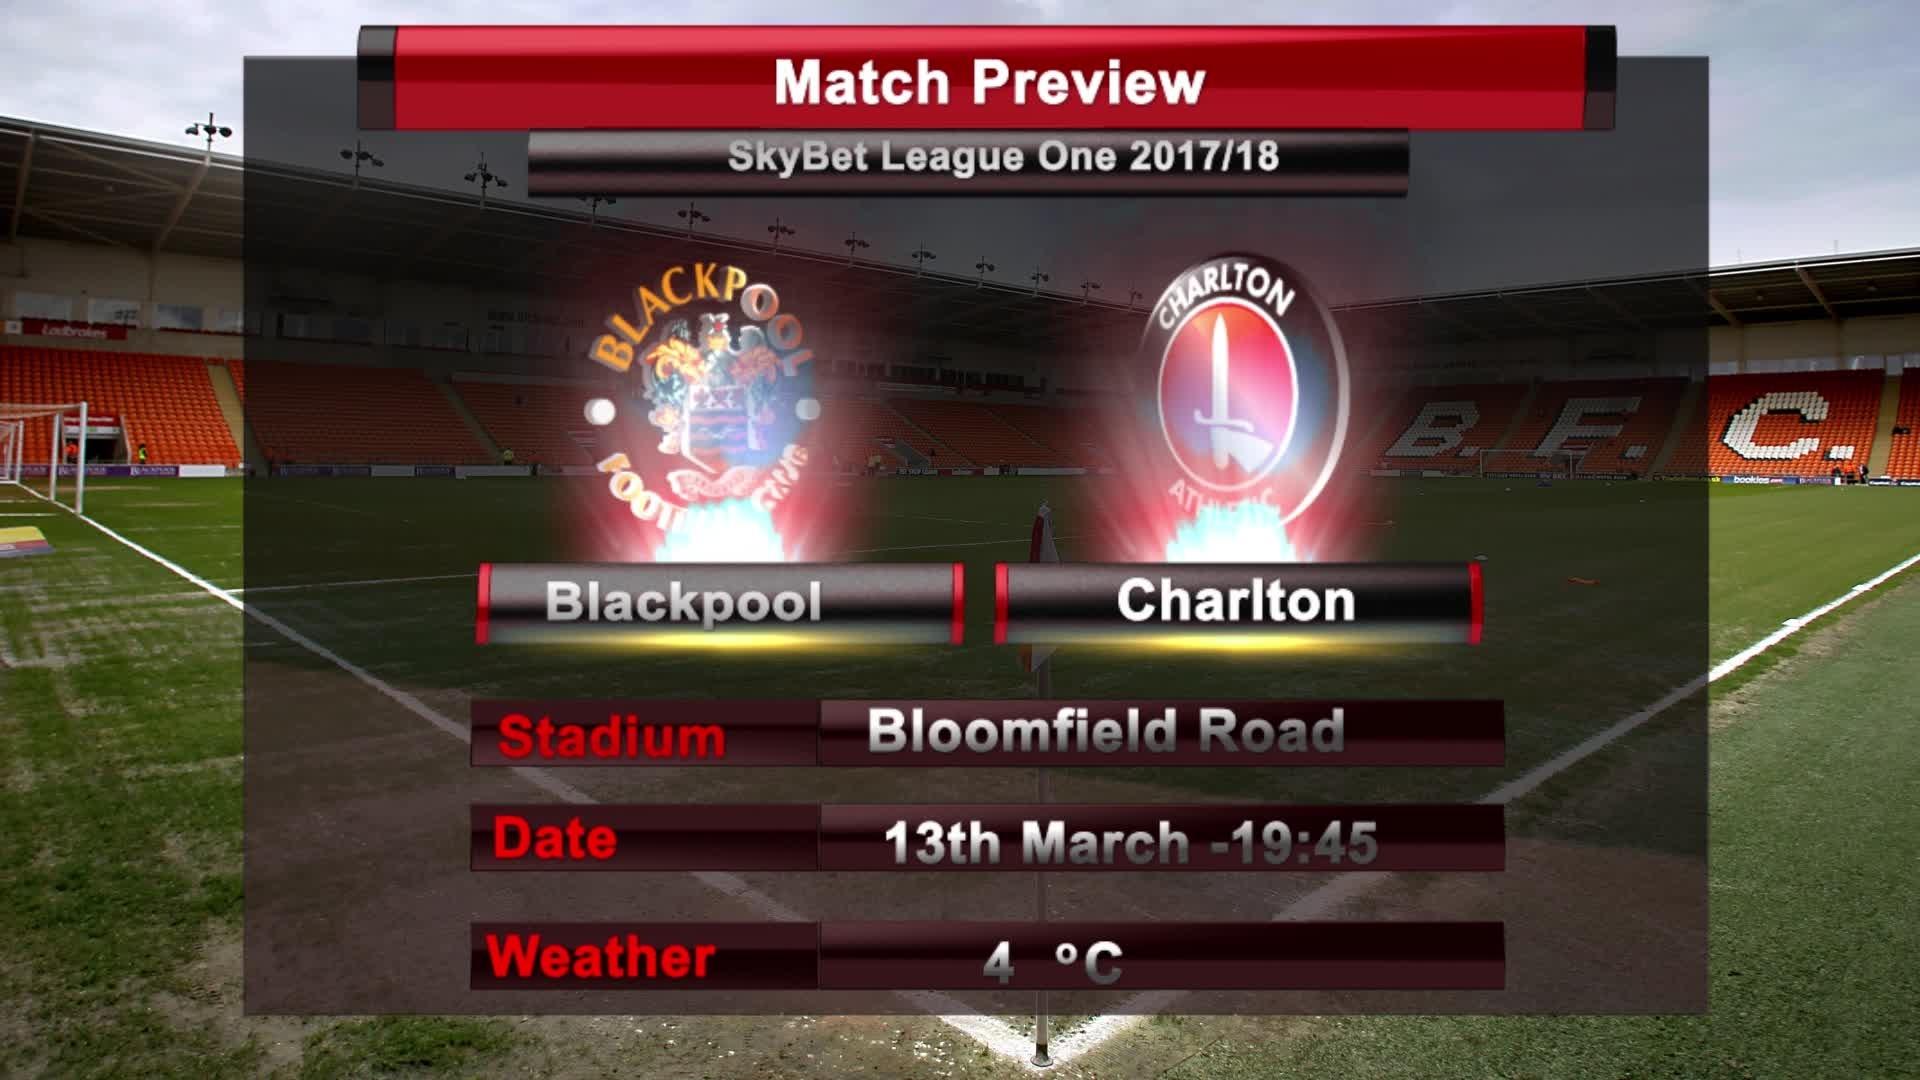 MATCH PREVIEW | Blackpool vs Charlton